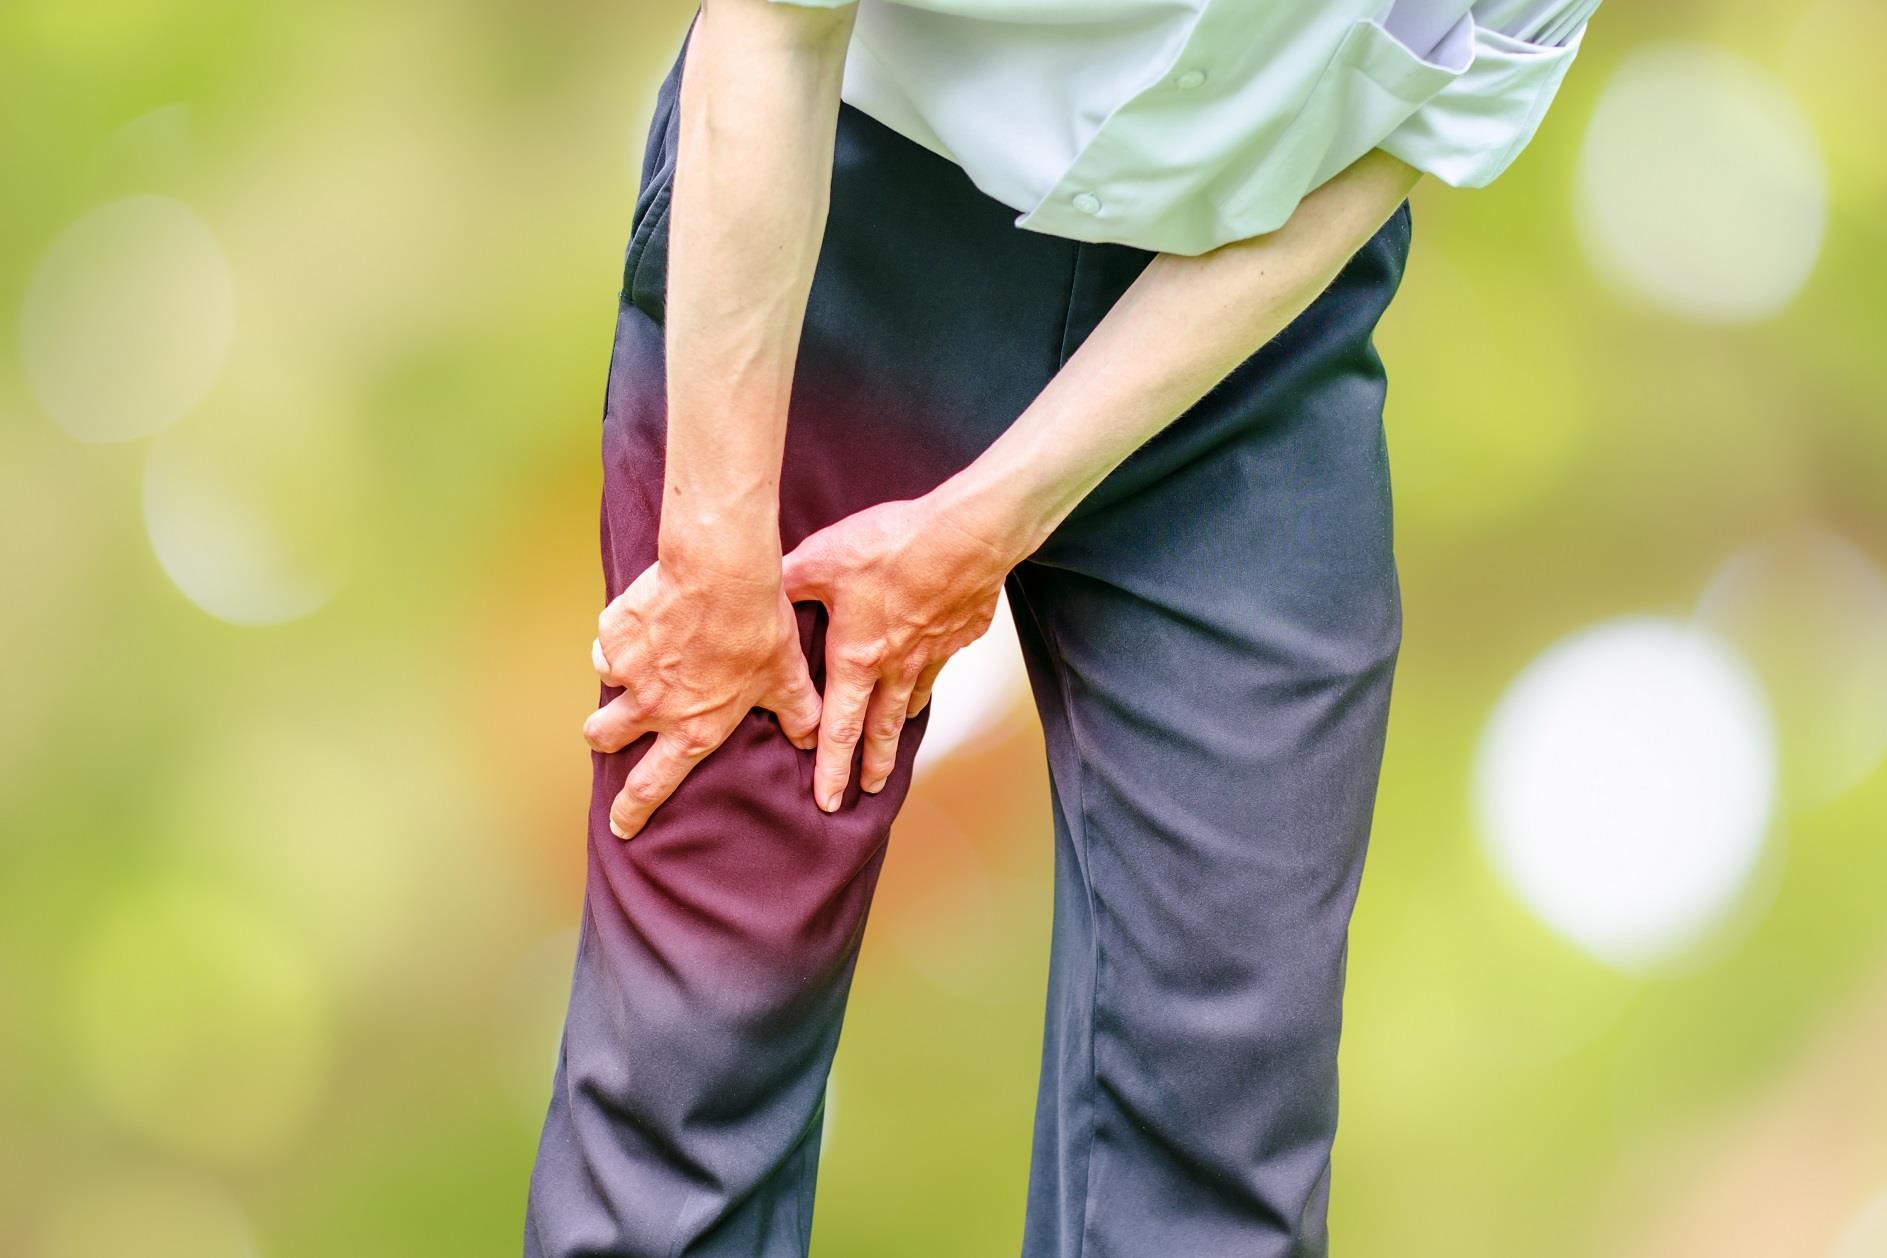 térdfájdalom csontritkulással